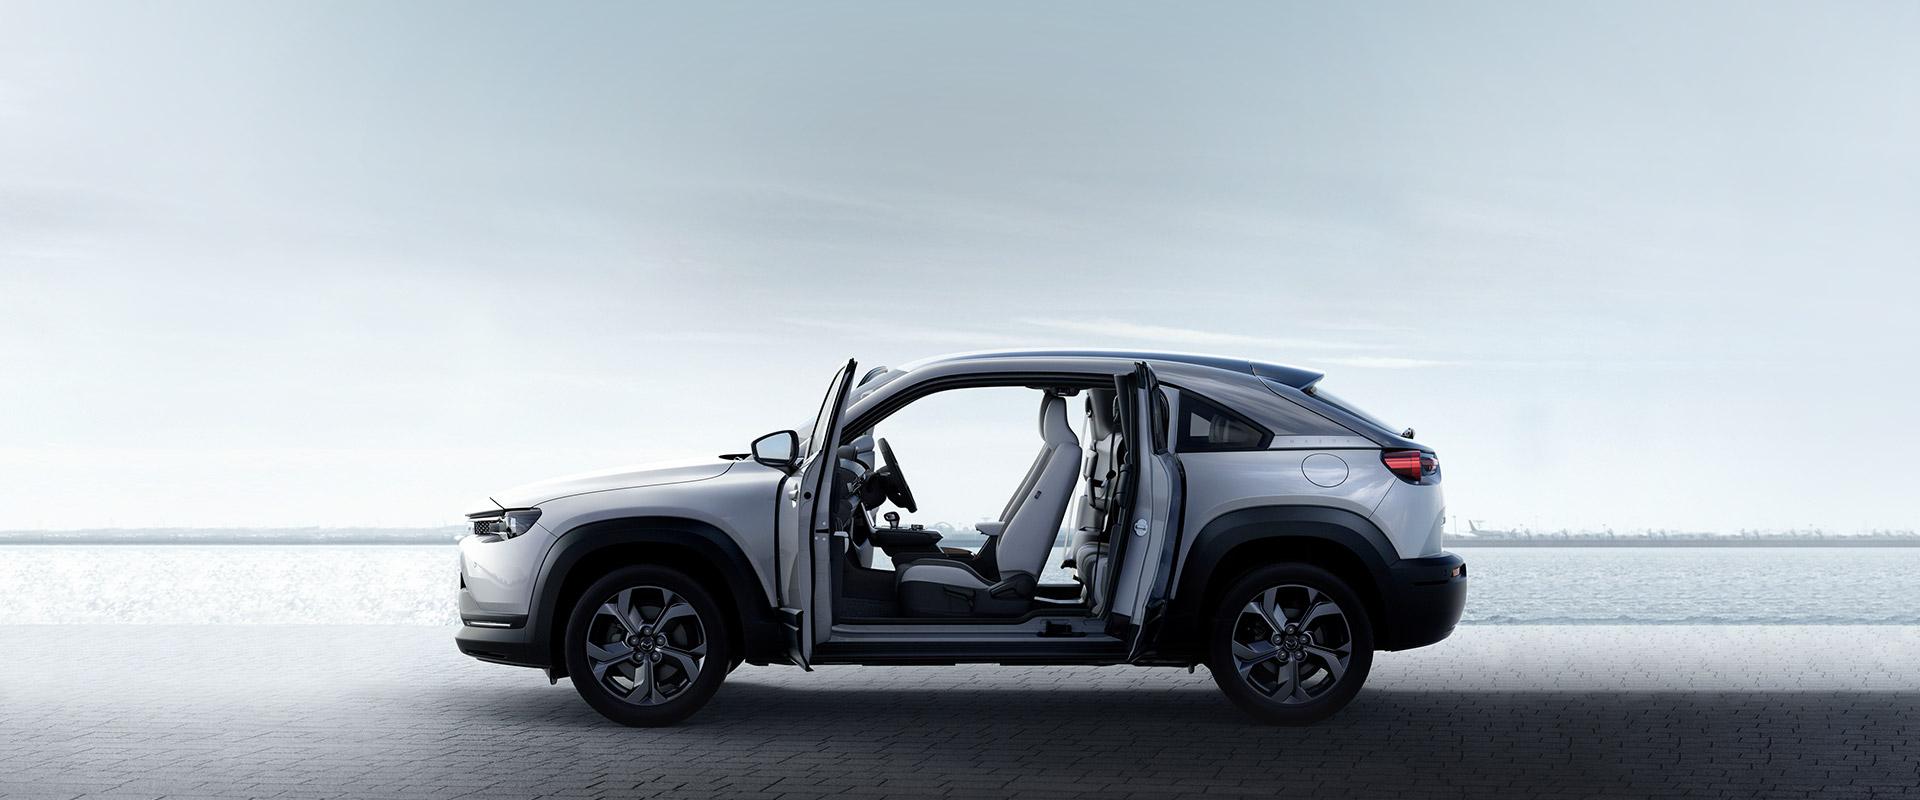 Kelebihan Kekurangan Mazda Jp Review